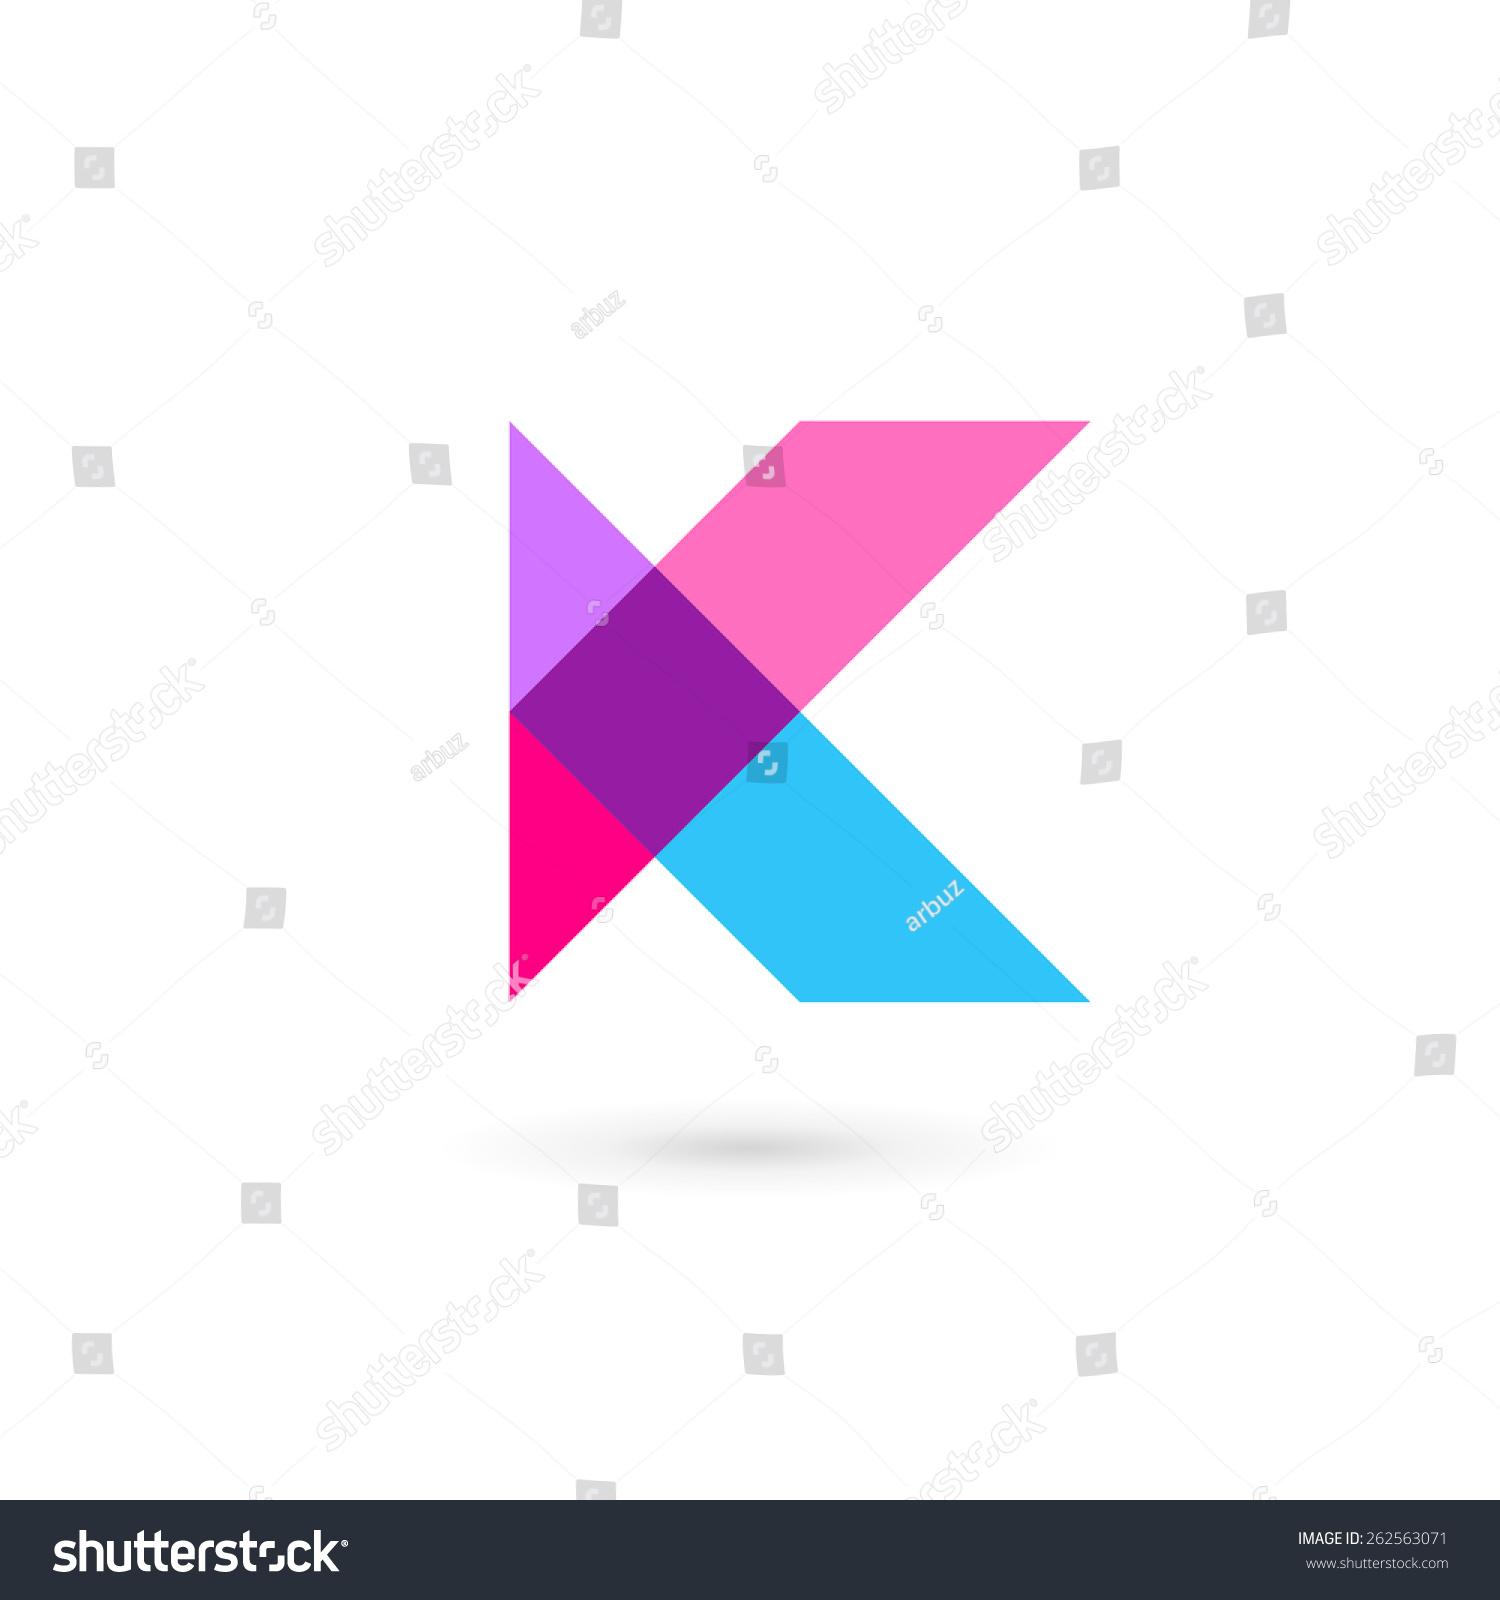 Letter k logo icon design template stock vector 262563071 letter k logo icon design template stock vector 262563071 shutterstock spiritdancerdesigns Images